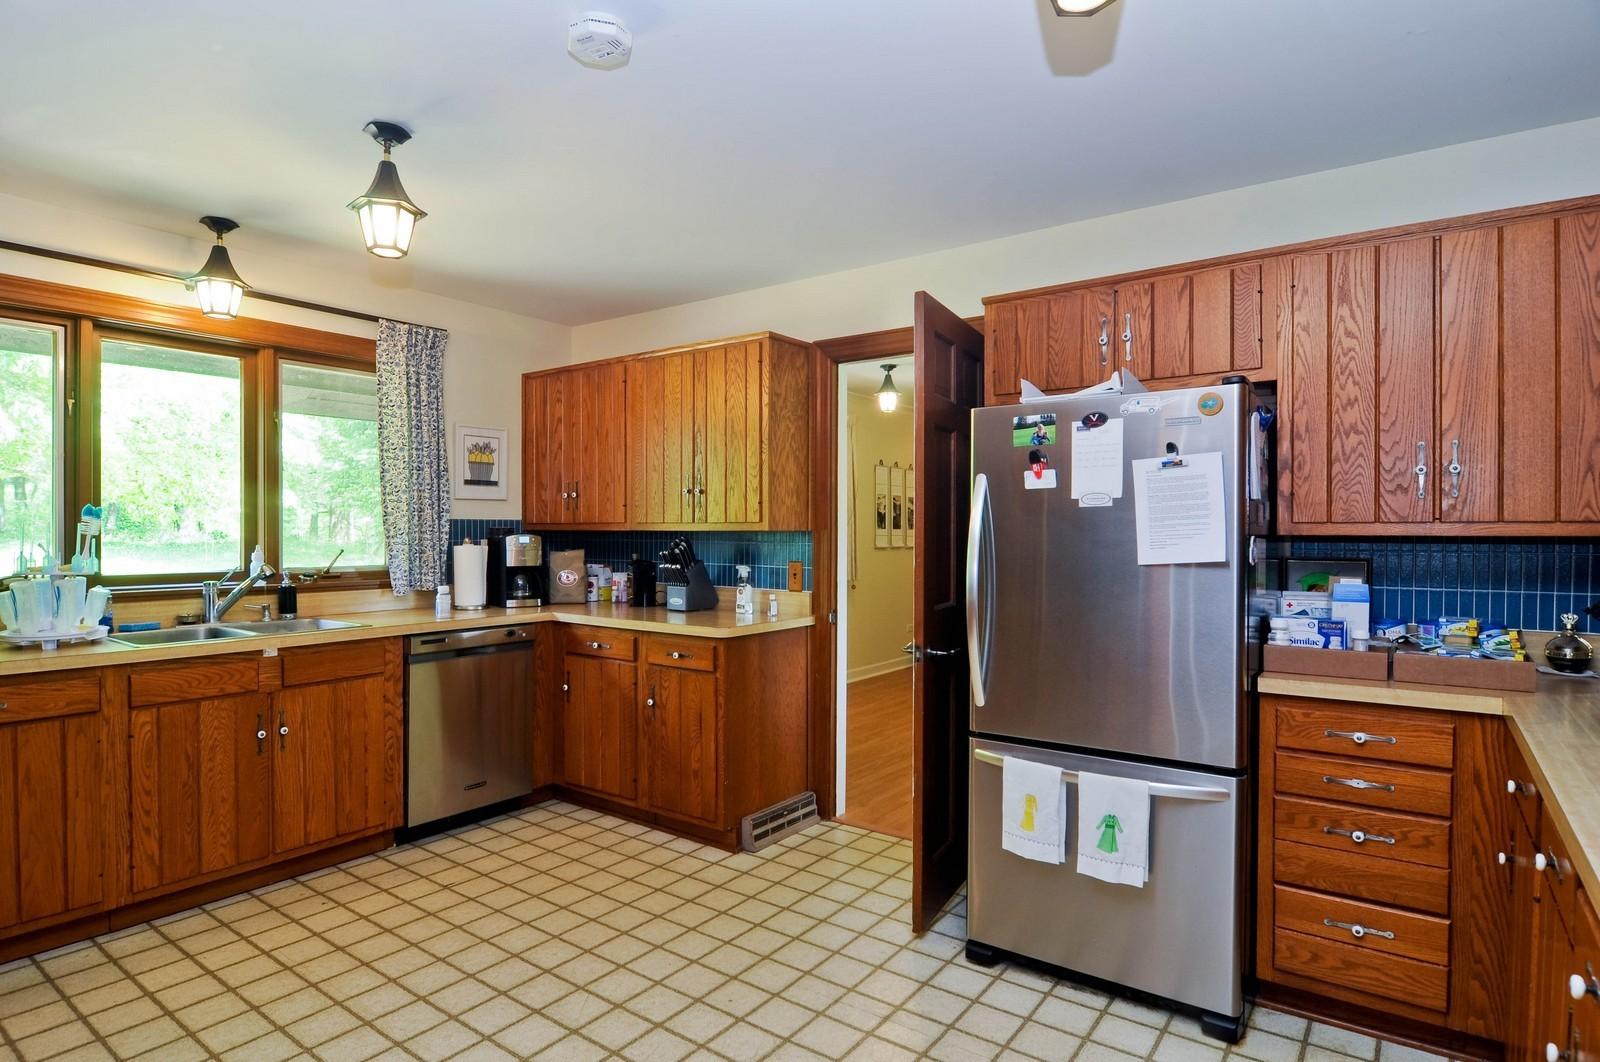 Real Estate Photography - 11 Ridgecroft, Barrington, IL, 60010 - Kitchen